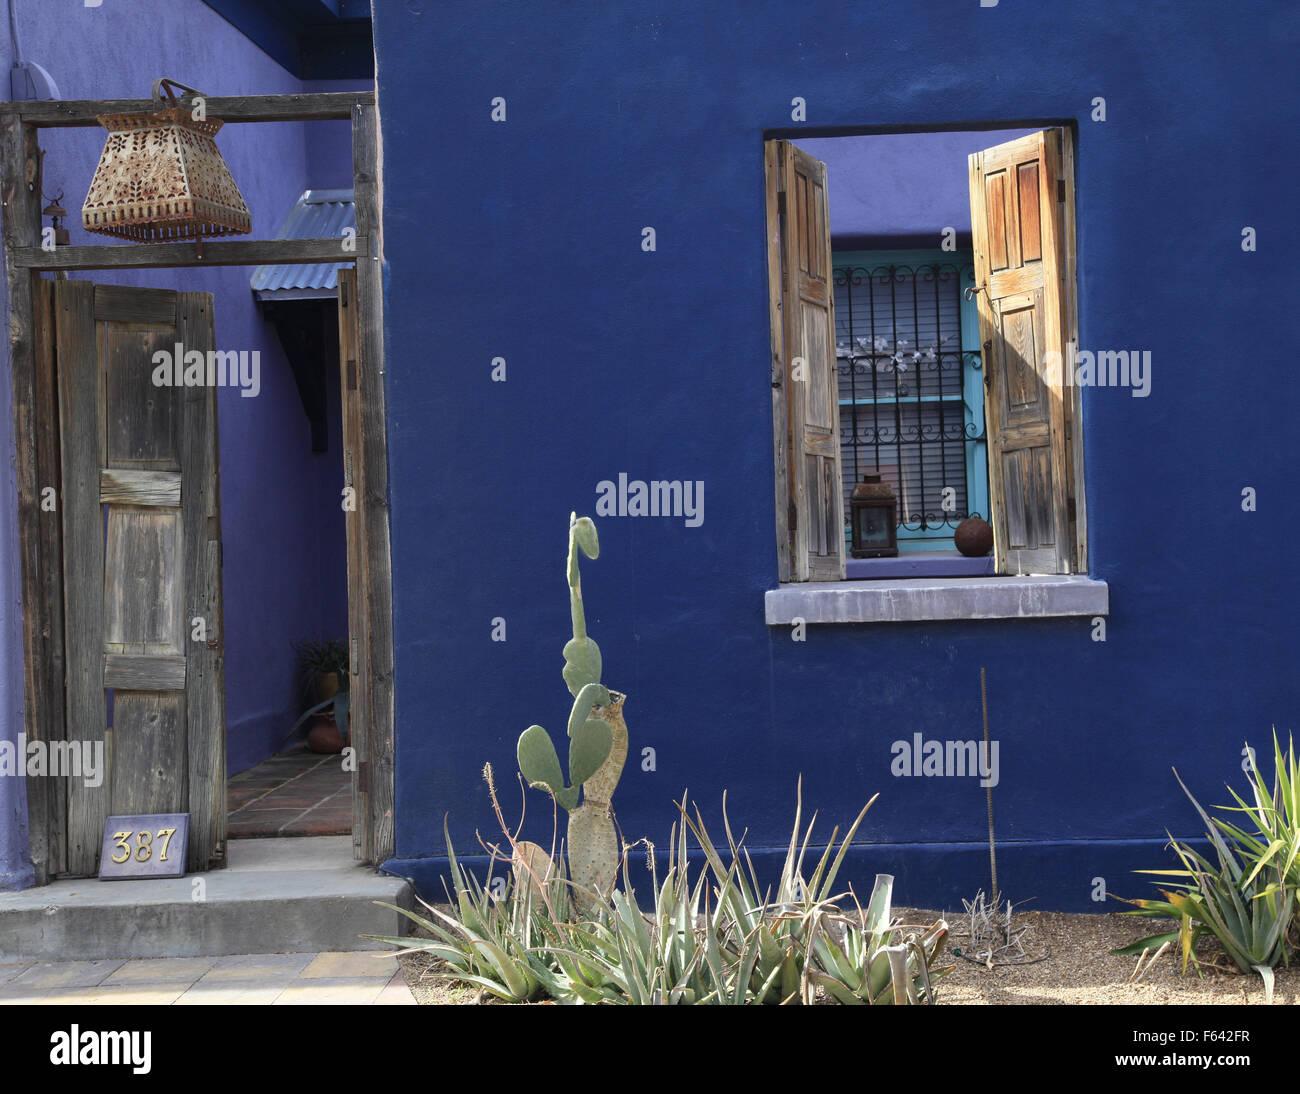 Mexican Theme Doors And Windows, Tucson Arizona